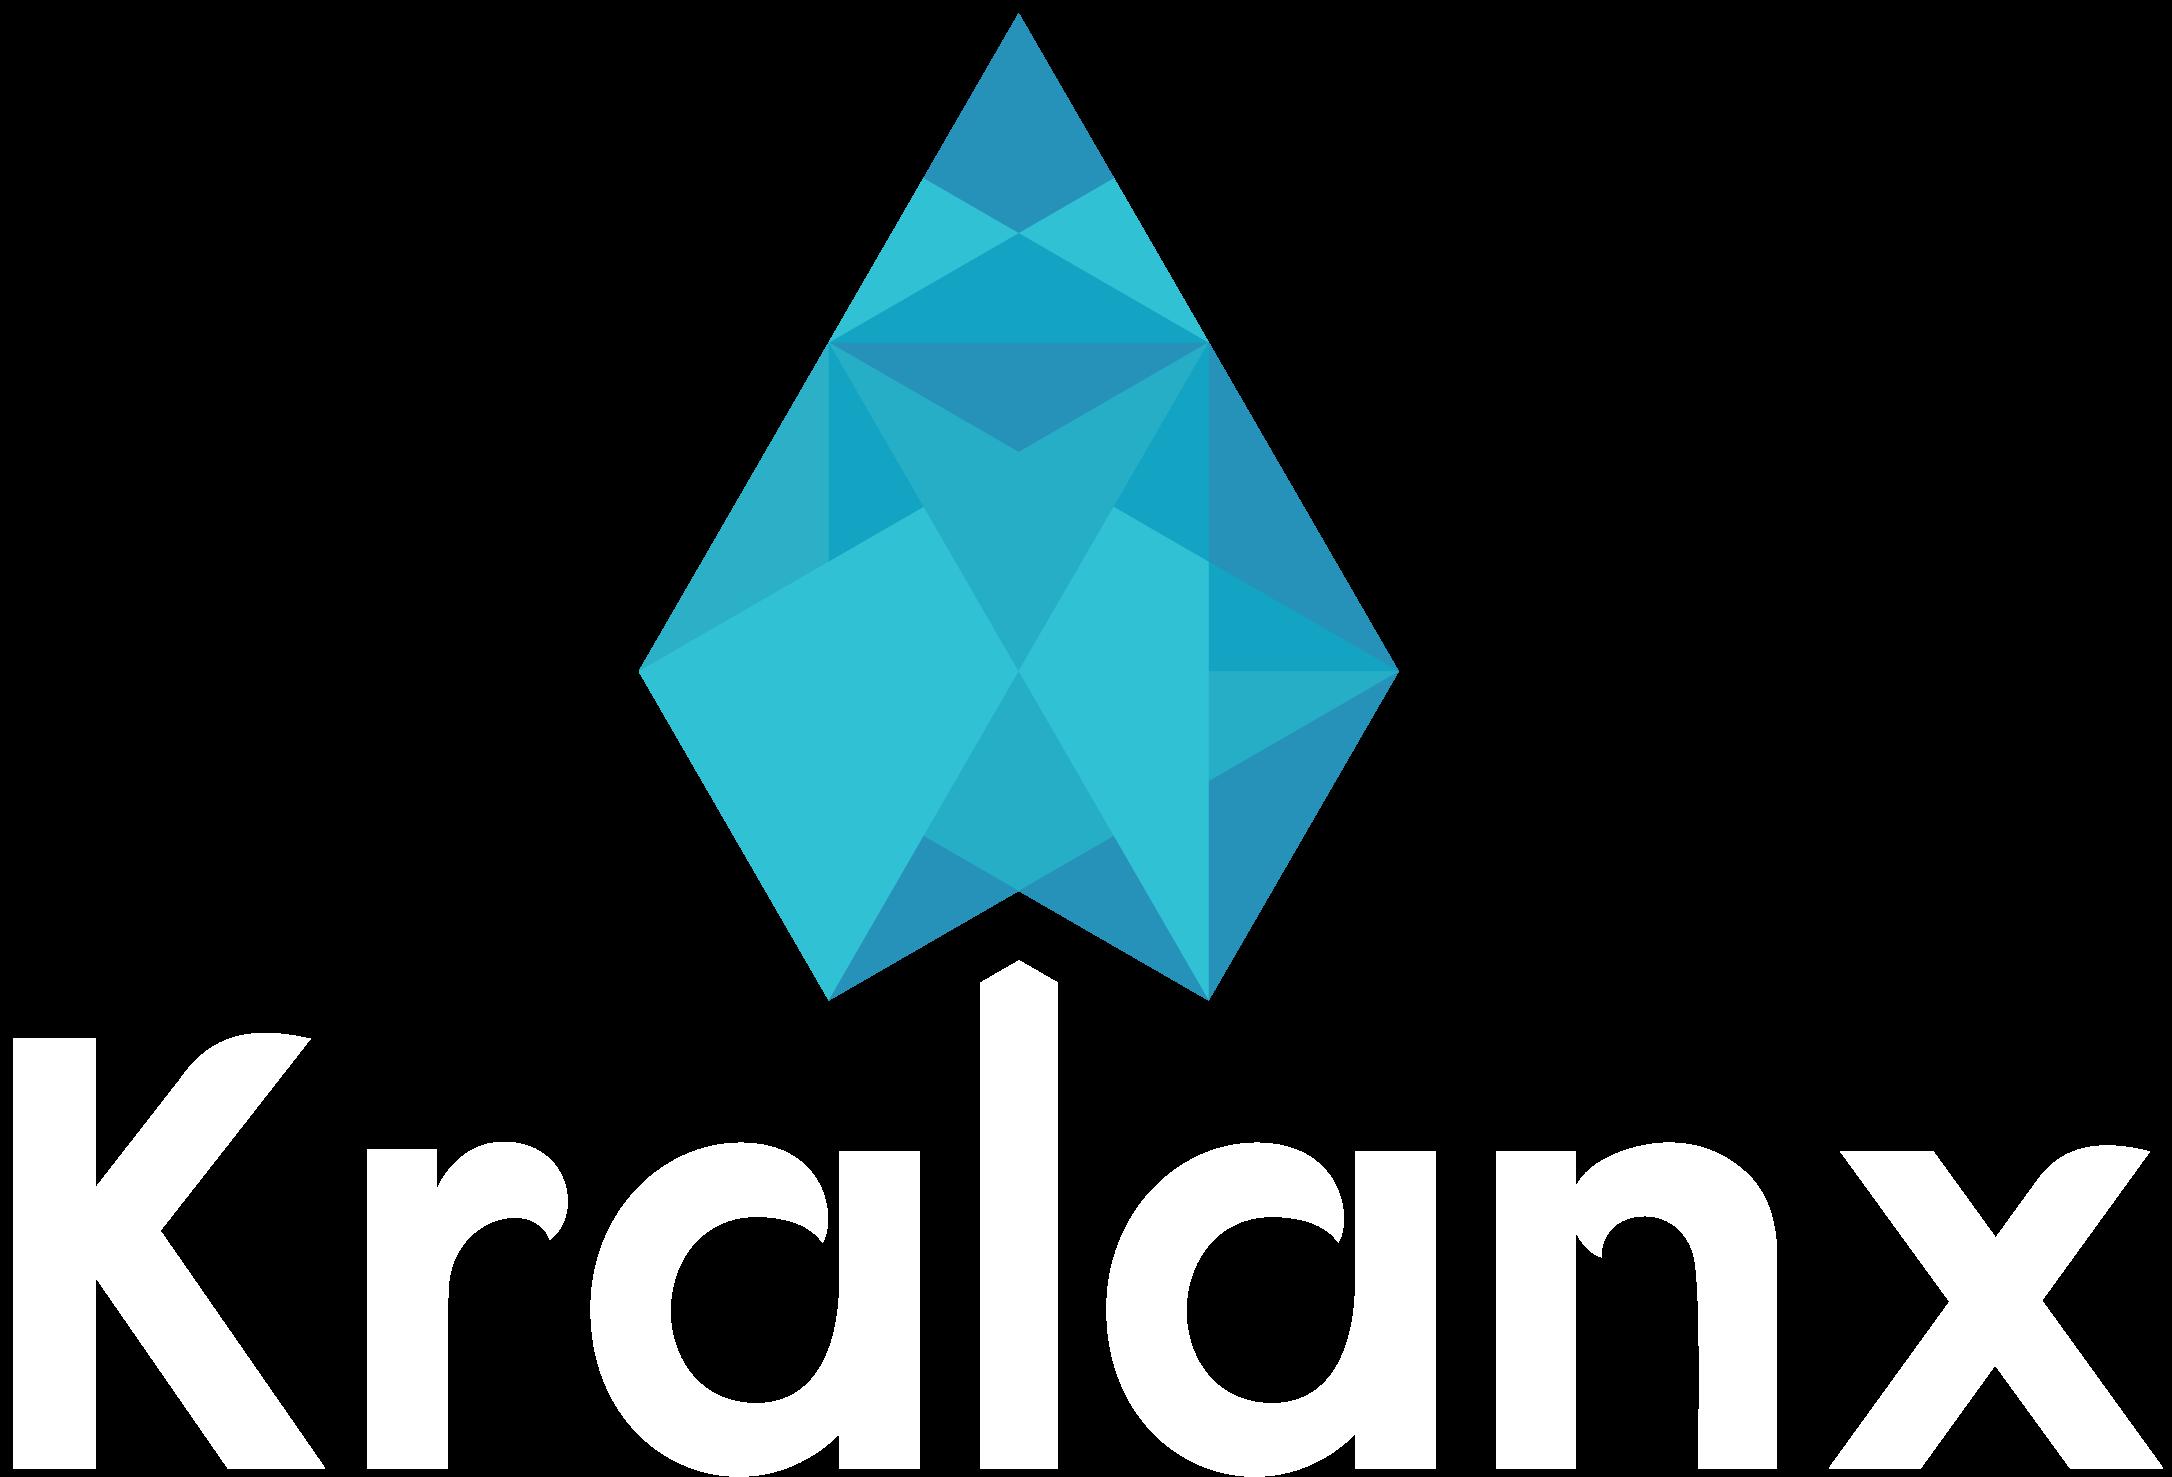 Kralanx